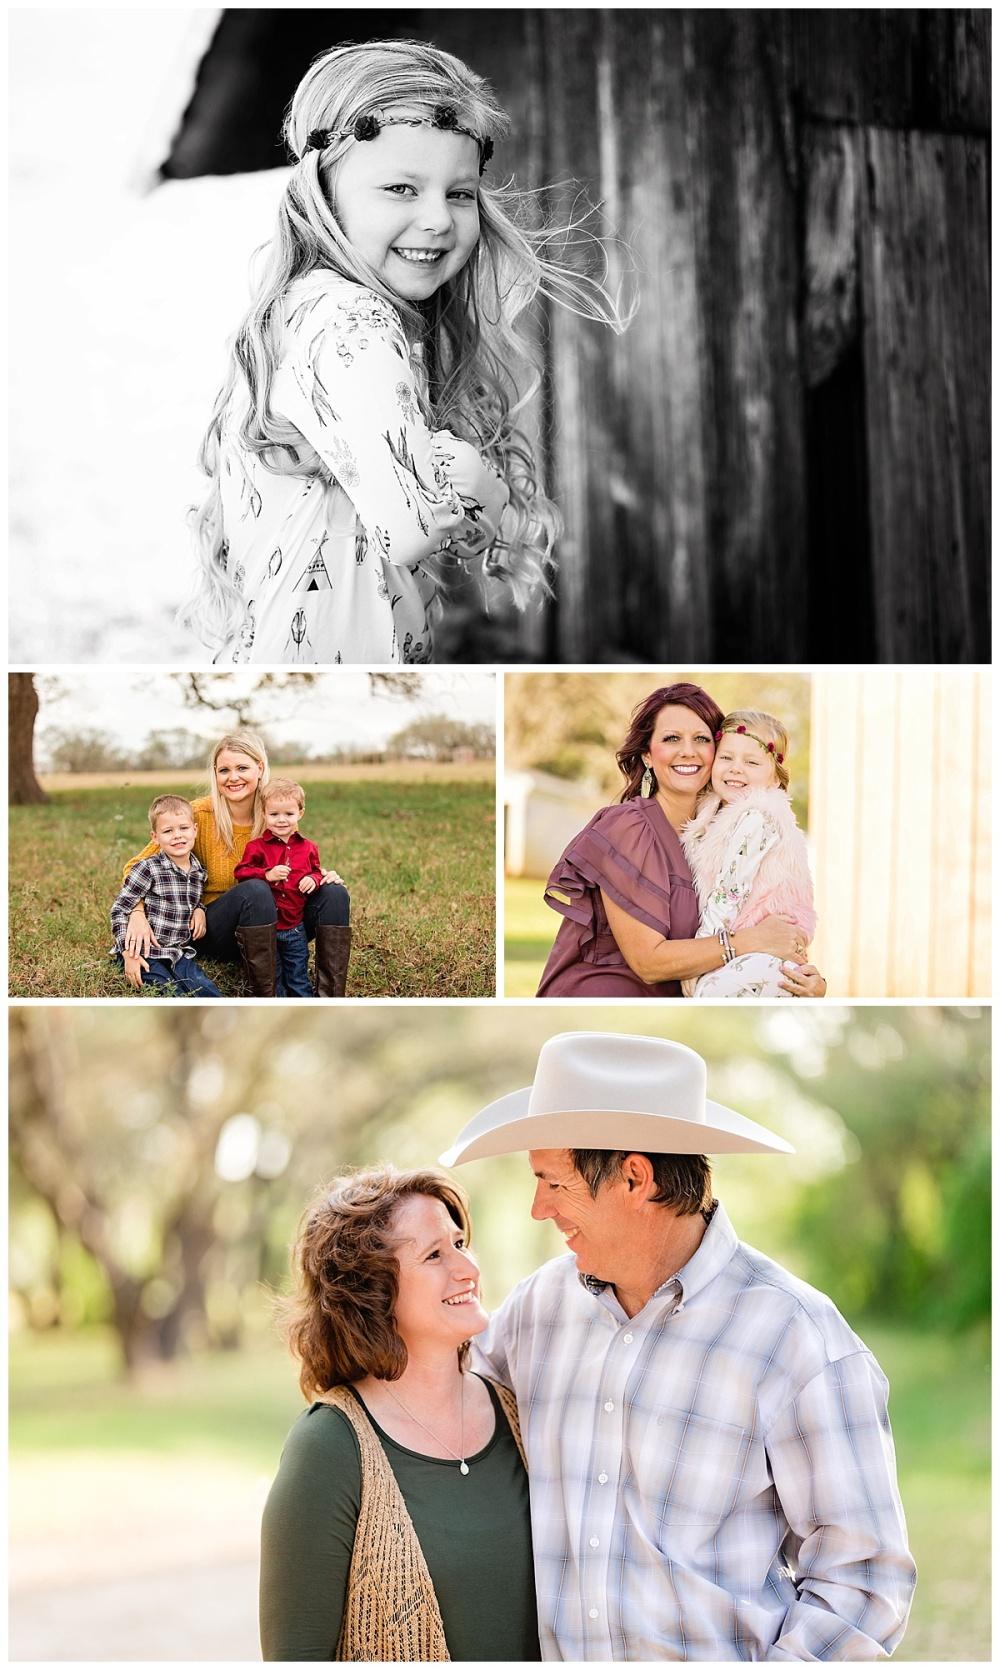 Carly-Barton-Photography-San-Antonio-Texas-Hill-Country-Fall-Heubaum_0138